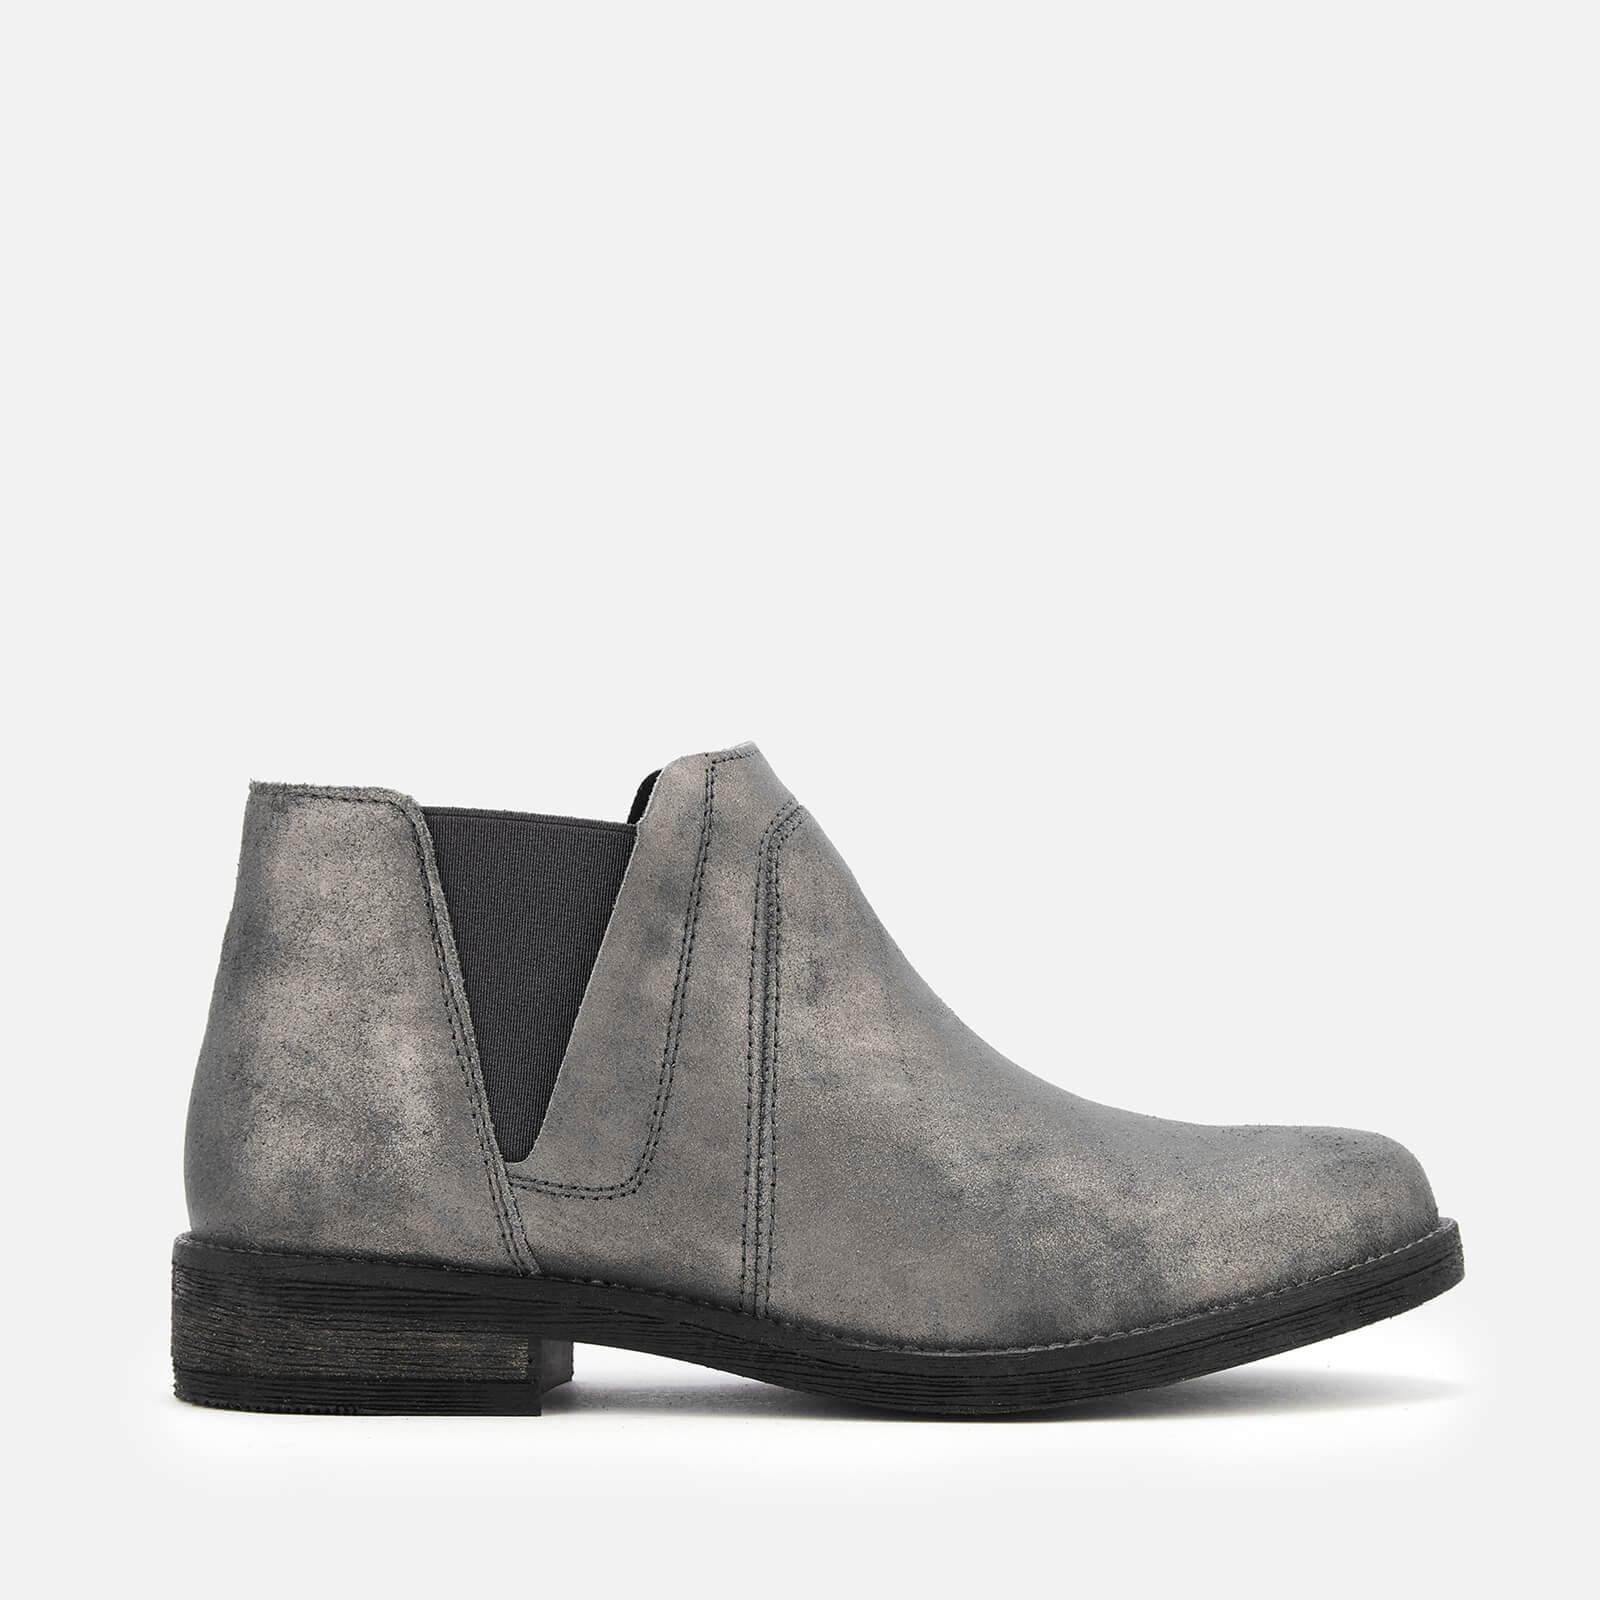 Clarks Women's Demi Beat Suede Ankle Boots - Dark Grey - UK 3 - Grey